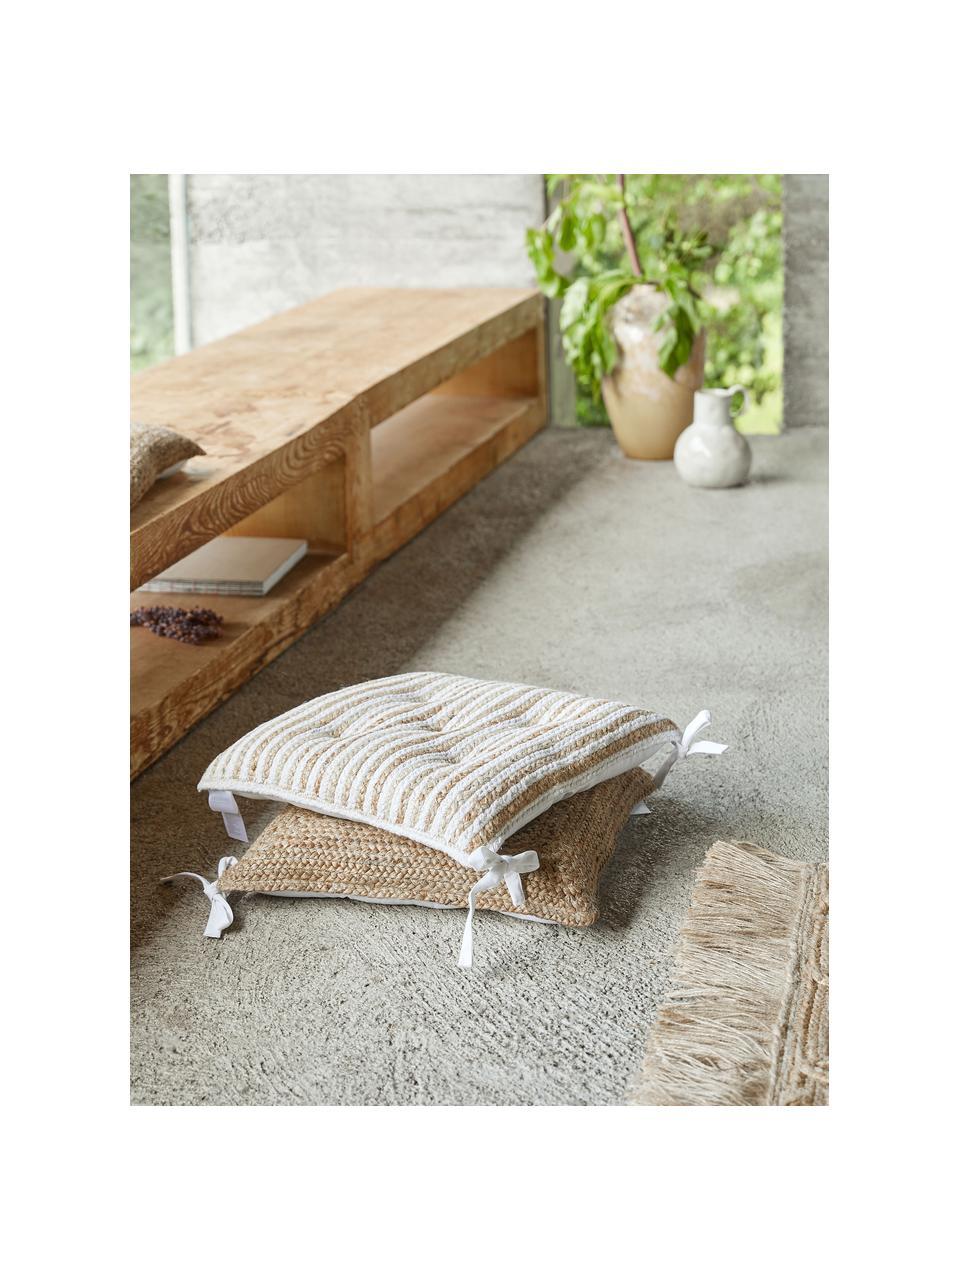 Cuscino sedia in juta Faeka, Retro: 100% cotone, Beige, bianco, Larg. 40 x Lung. 40 cm